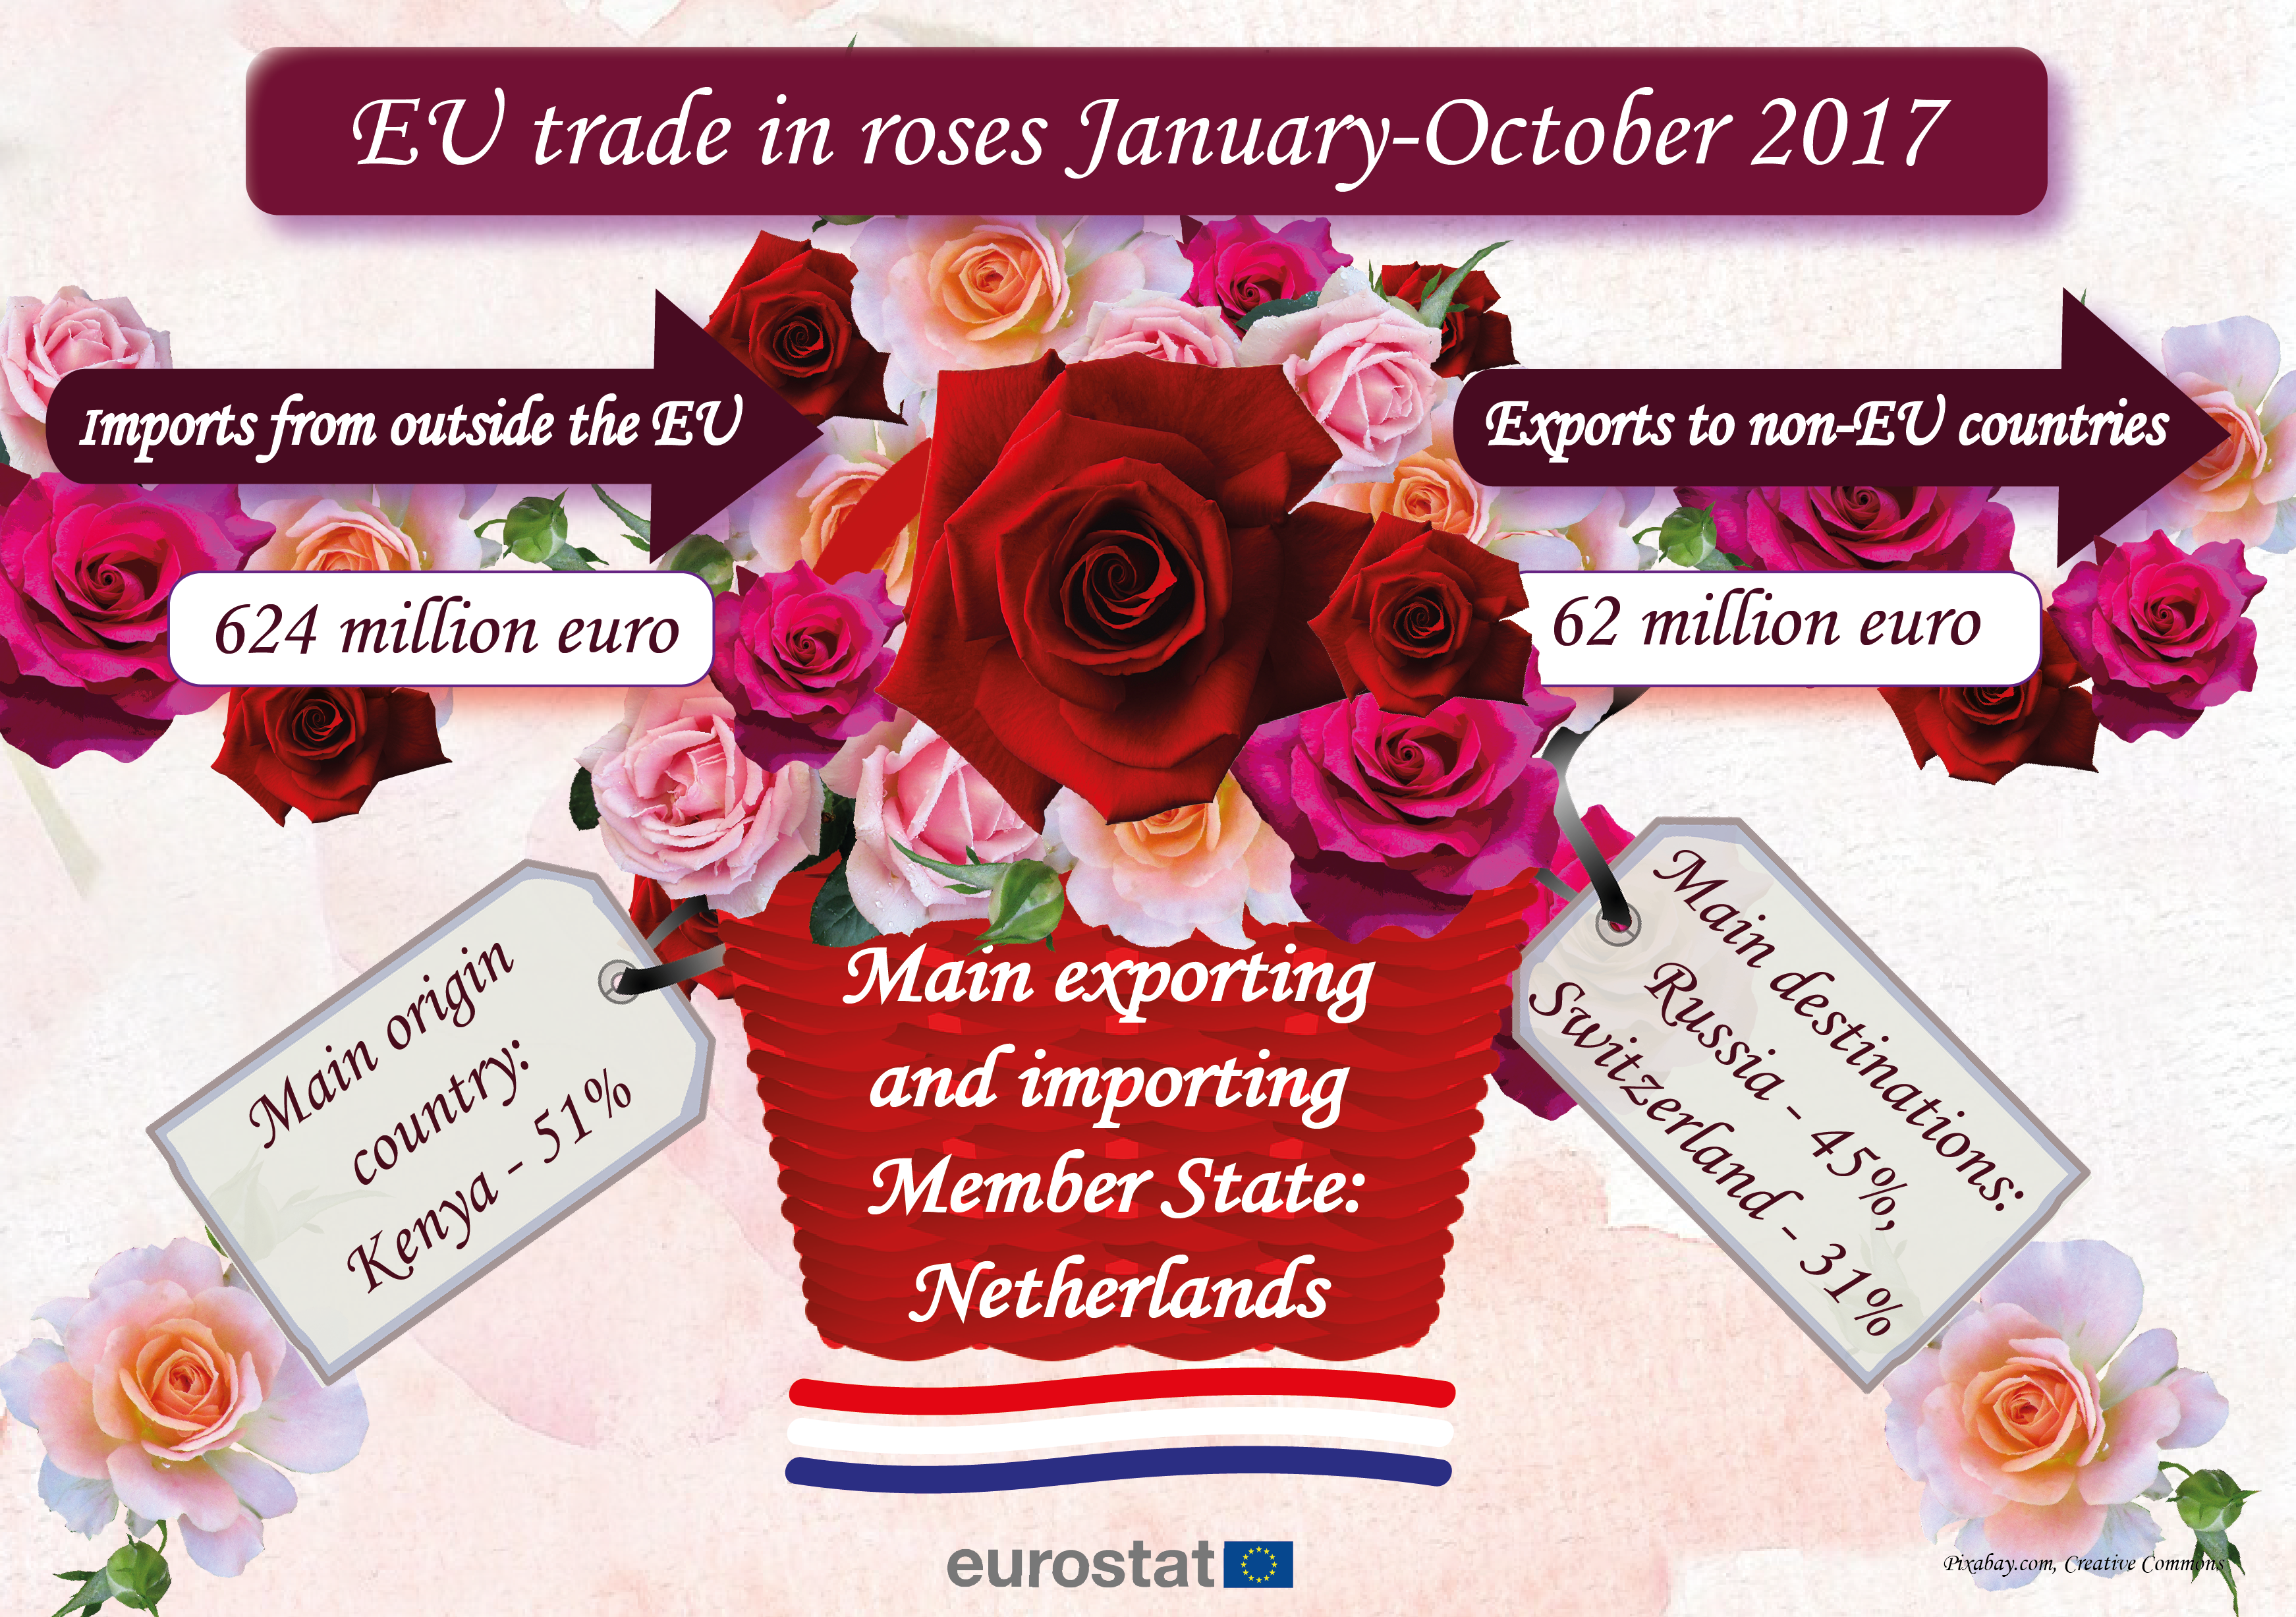 Trade in roses